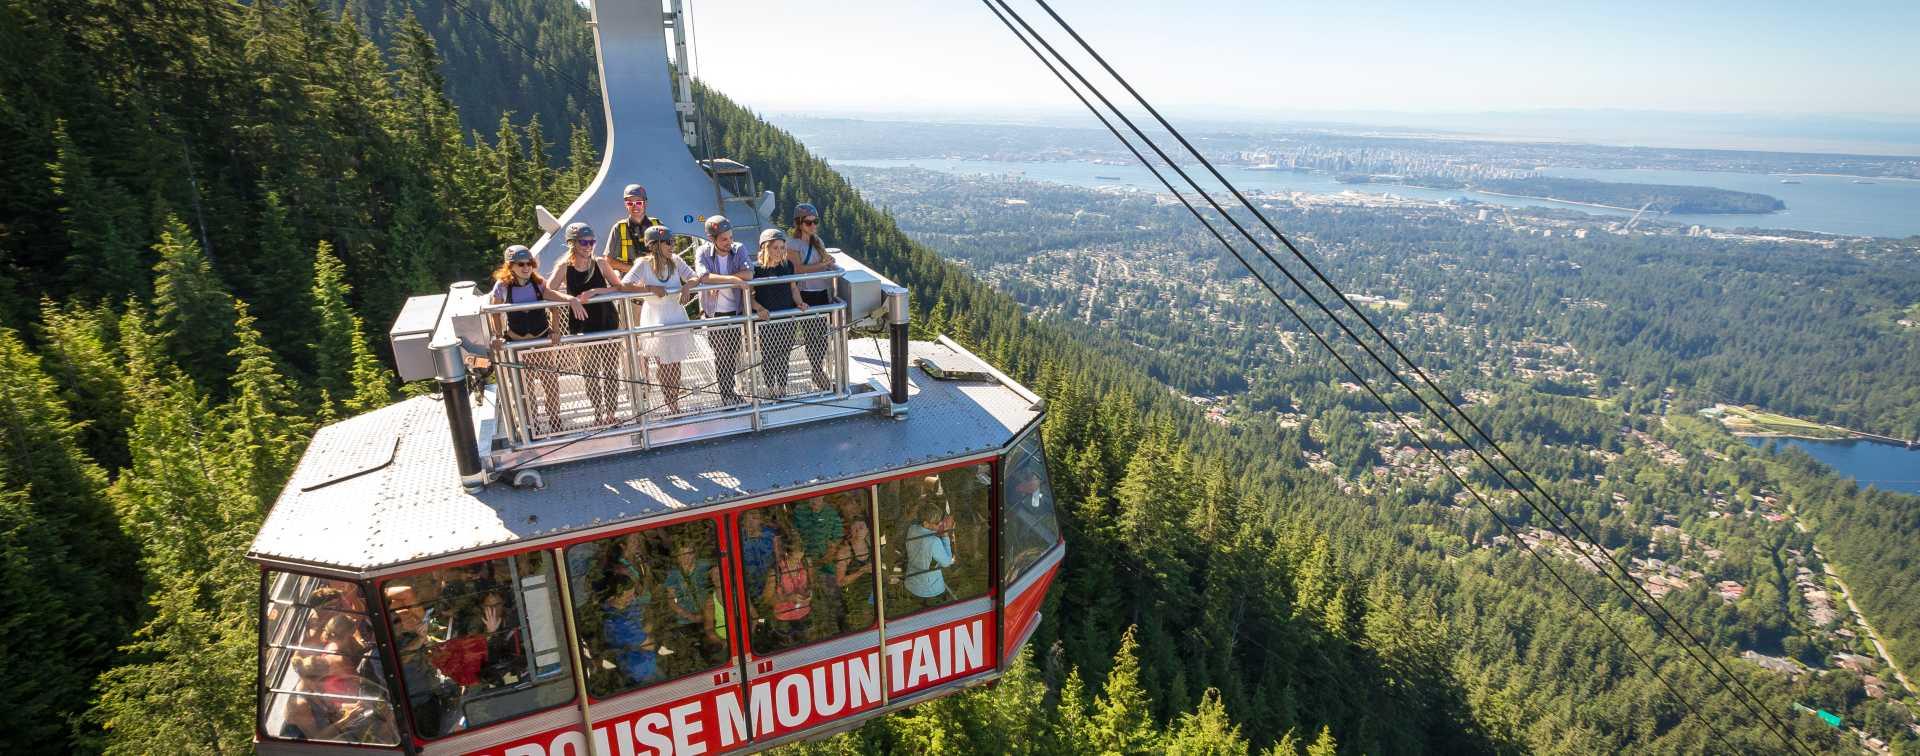 Grouse Mountain Tram